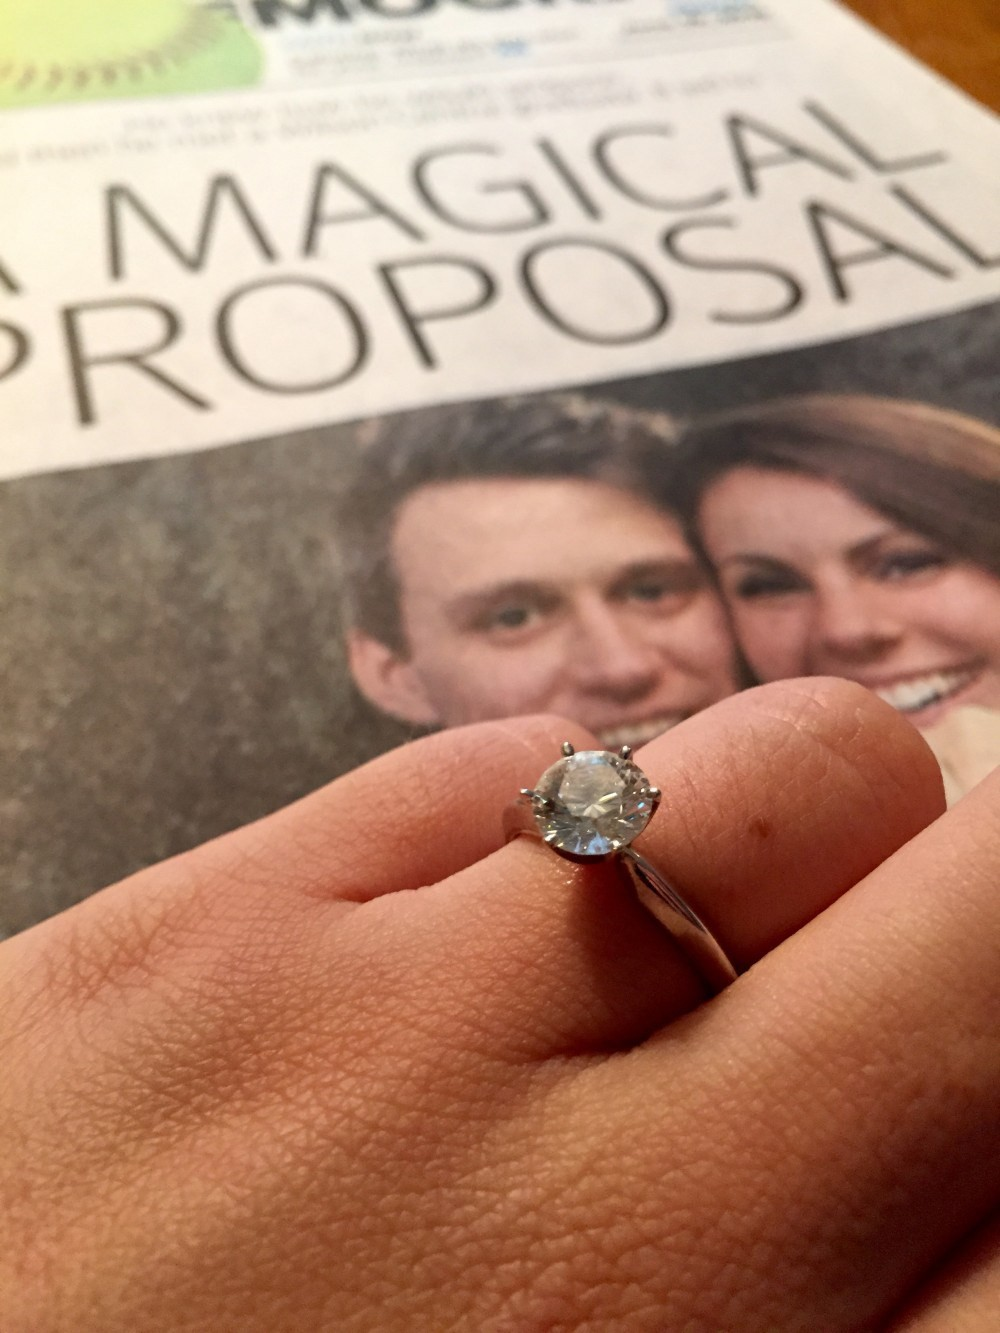 Image 7 of Sarai and Nathan's Incredible Magic Trick Proposal